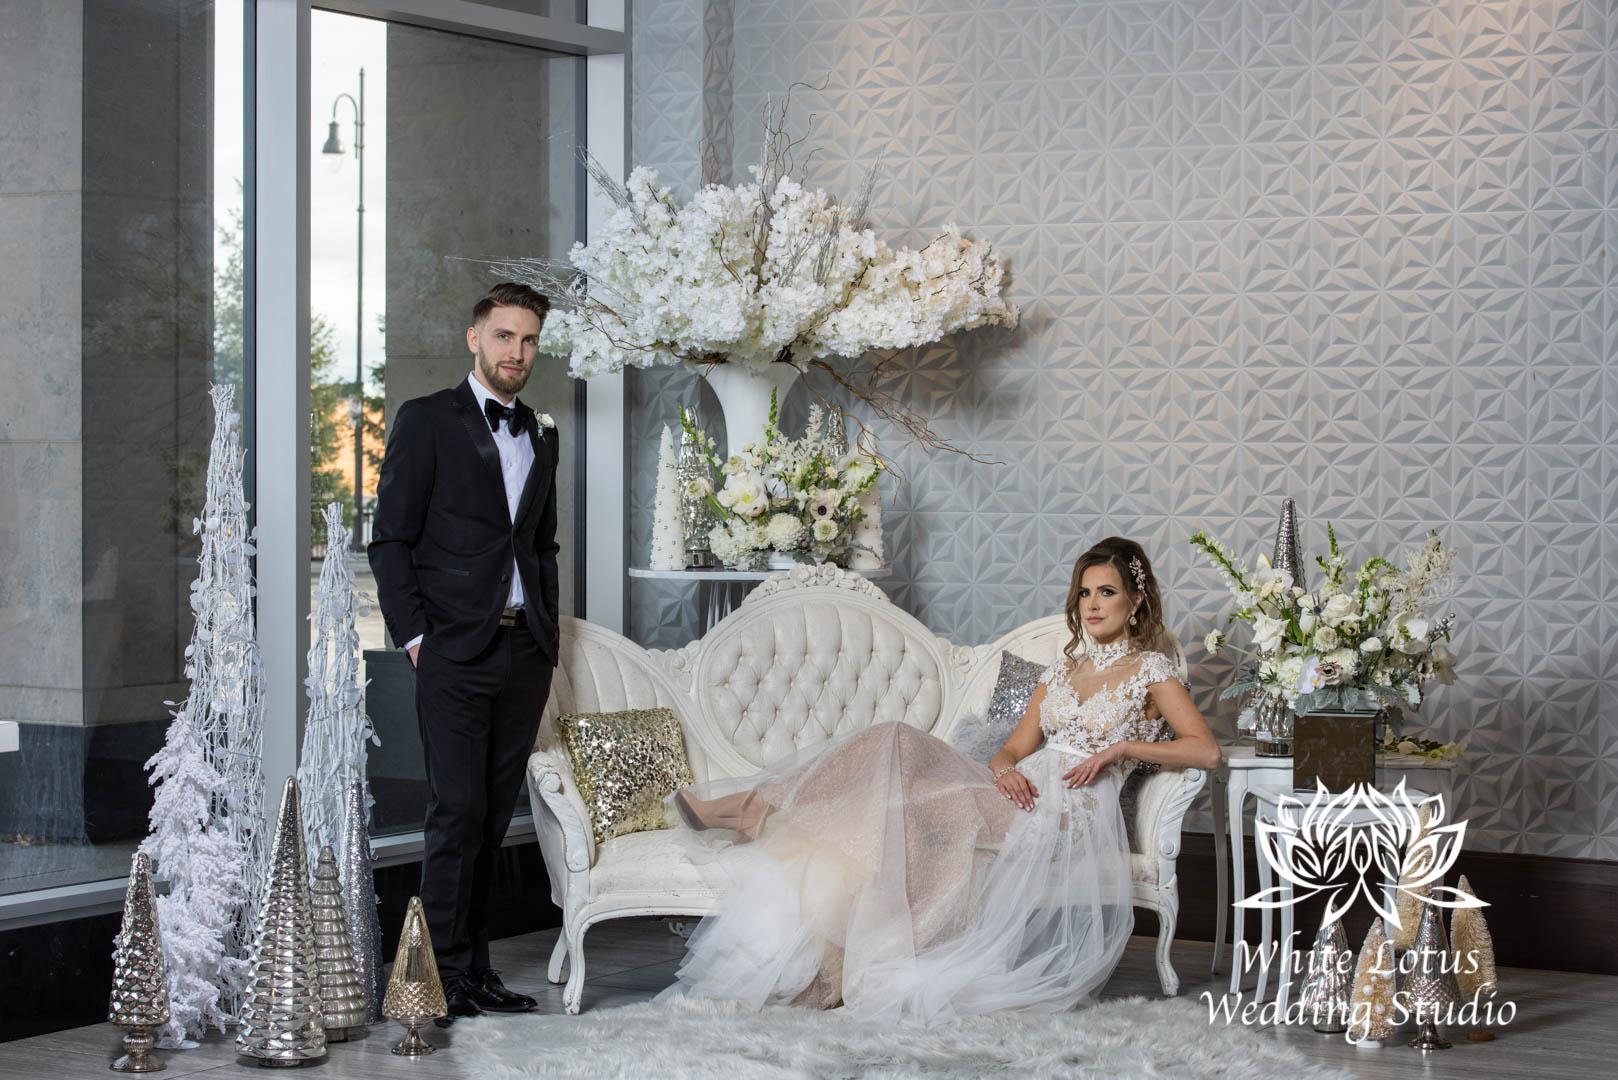 060- GLAM WINTERLUXE WEDDING INSPIRATION